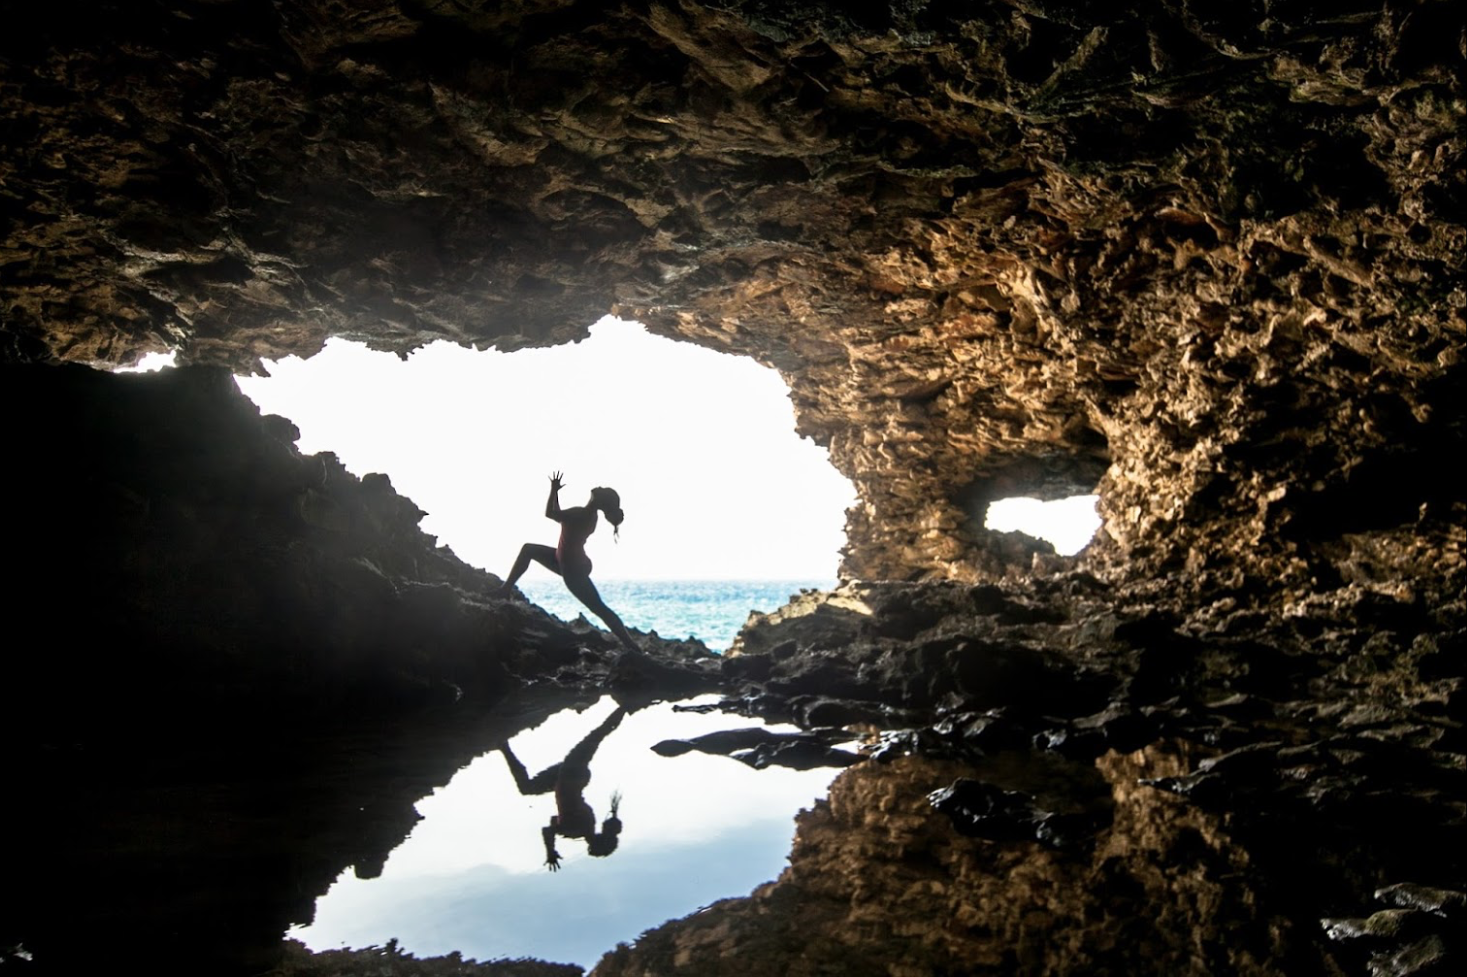 Cave opening to Atlantic Ocean